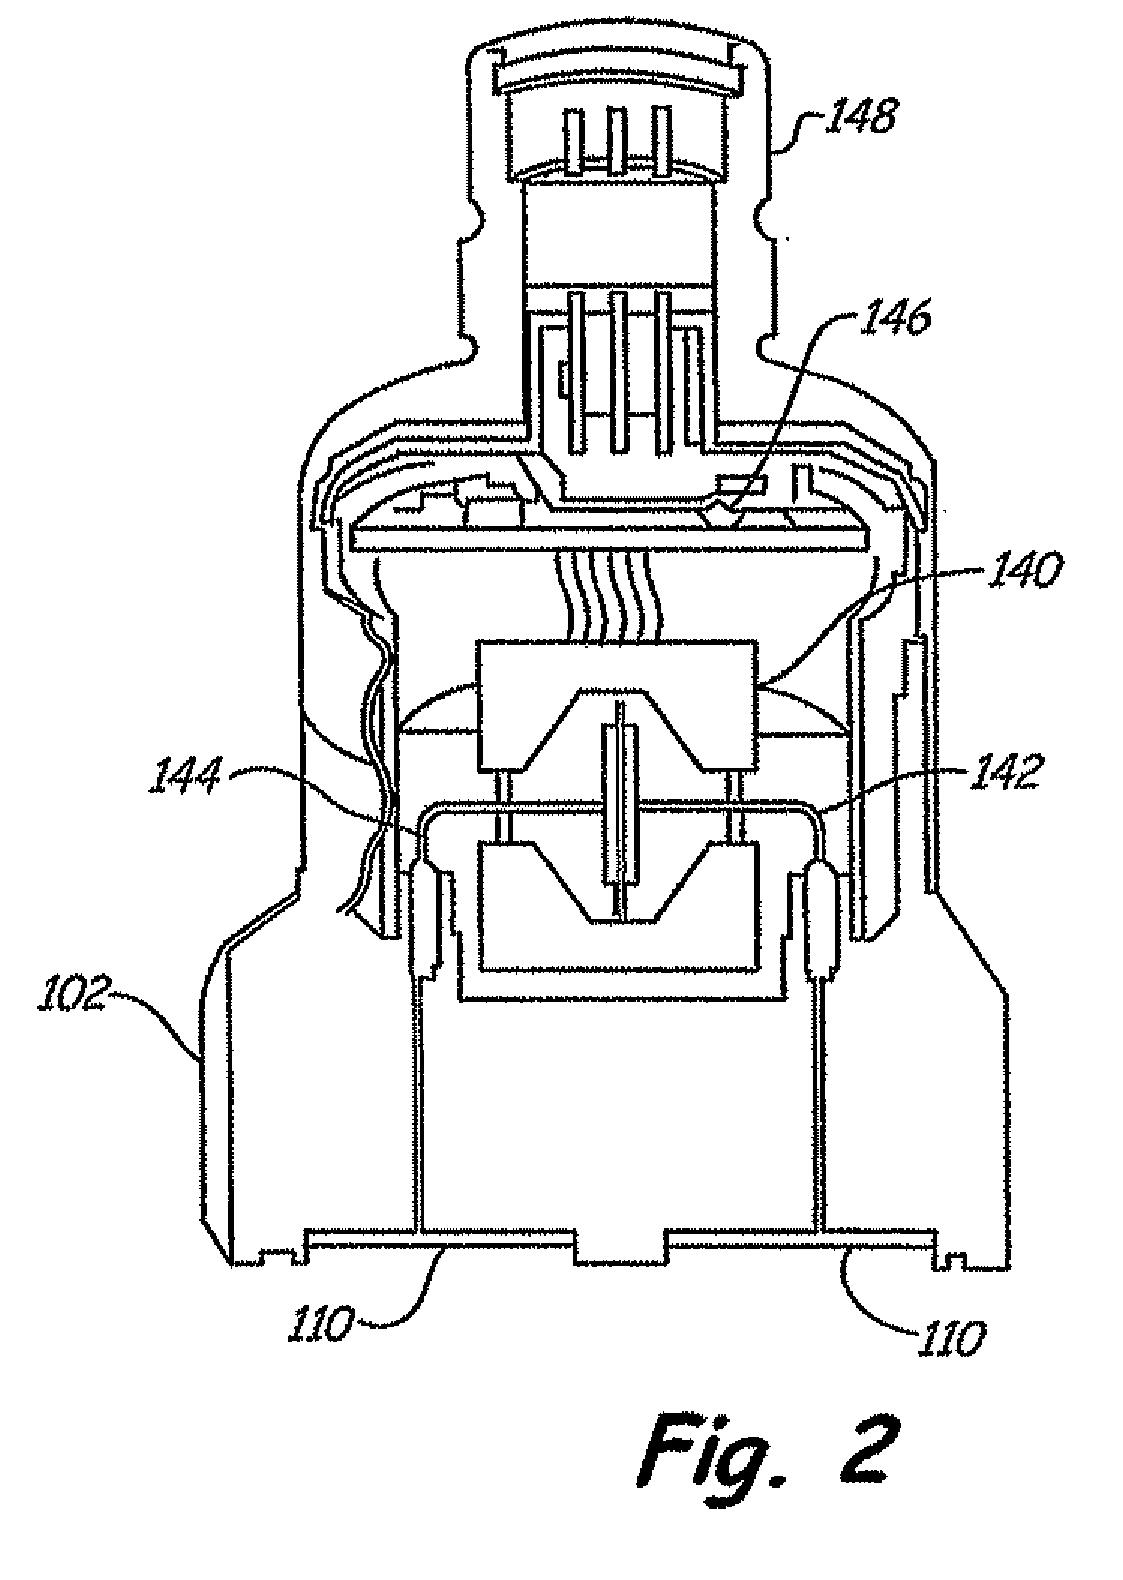 Perfect cole hersee 24059 wiring diagram festooning simple wiring